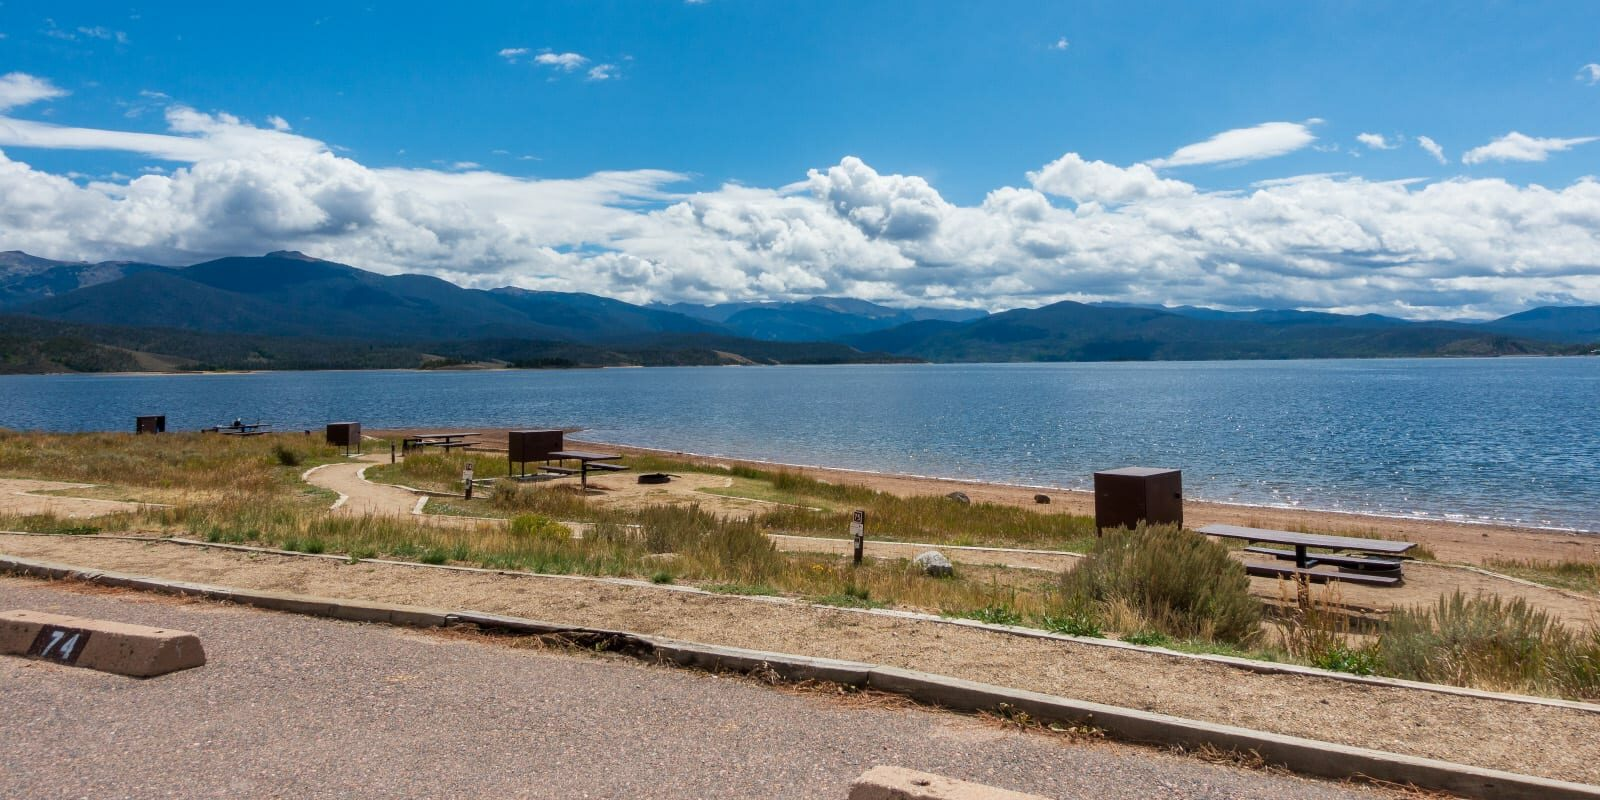 Lake Granby Lakeside Campsites Arapaho National Recreation Area Colorado